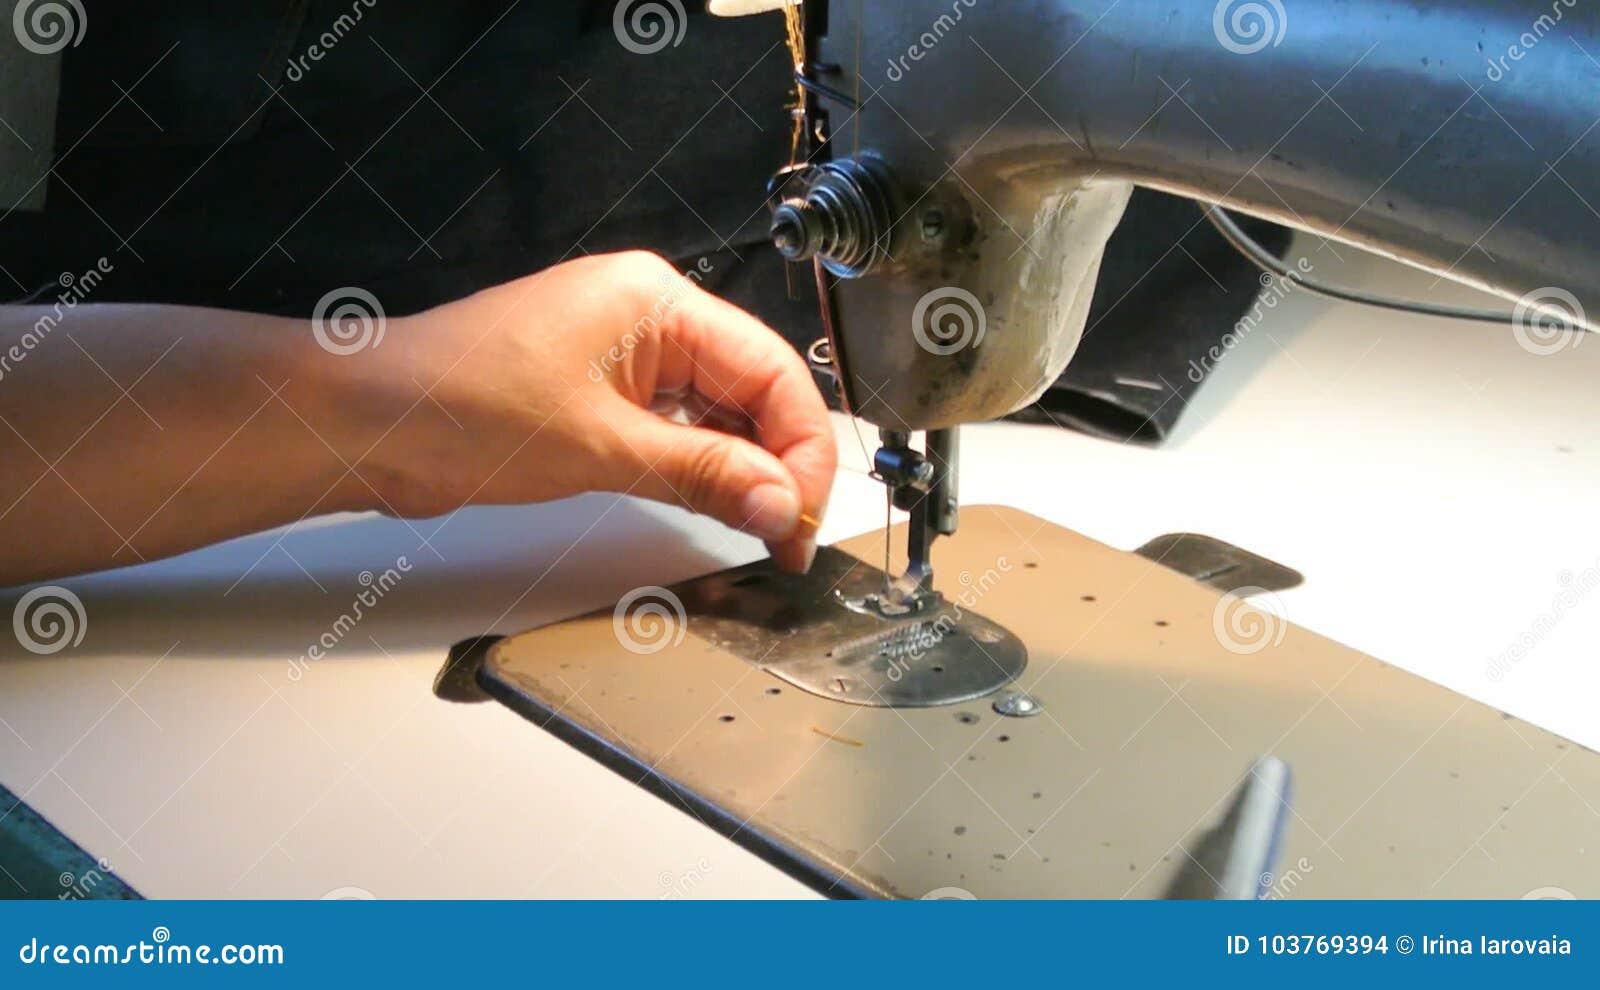 Home Seamstress Preparing The Sewing Machine To Work Dressmaker Custom How To Thread Dressmaker Sewing Machine